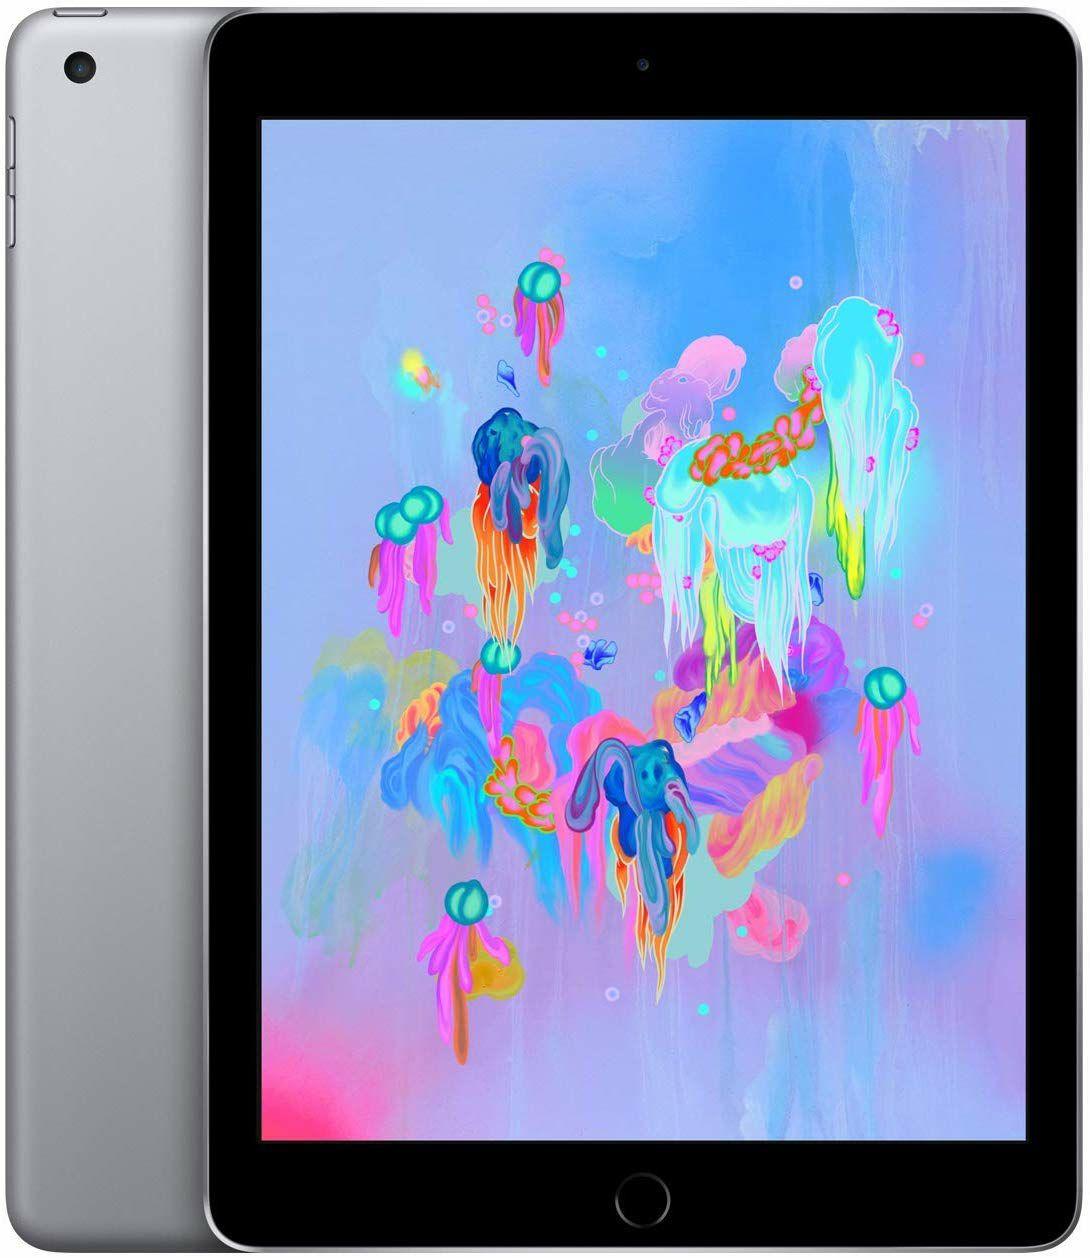 "Apple iPad Tablet 9.7"" (2018) - 128GB (Amazon.it)"